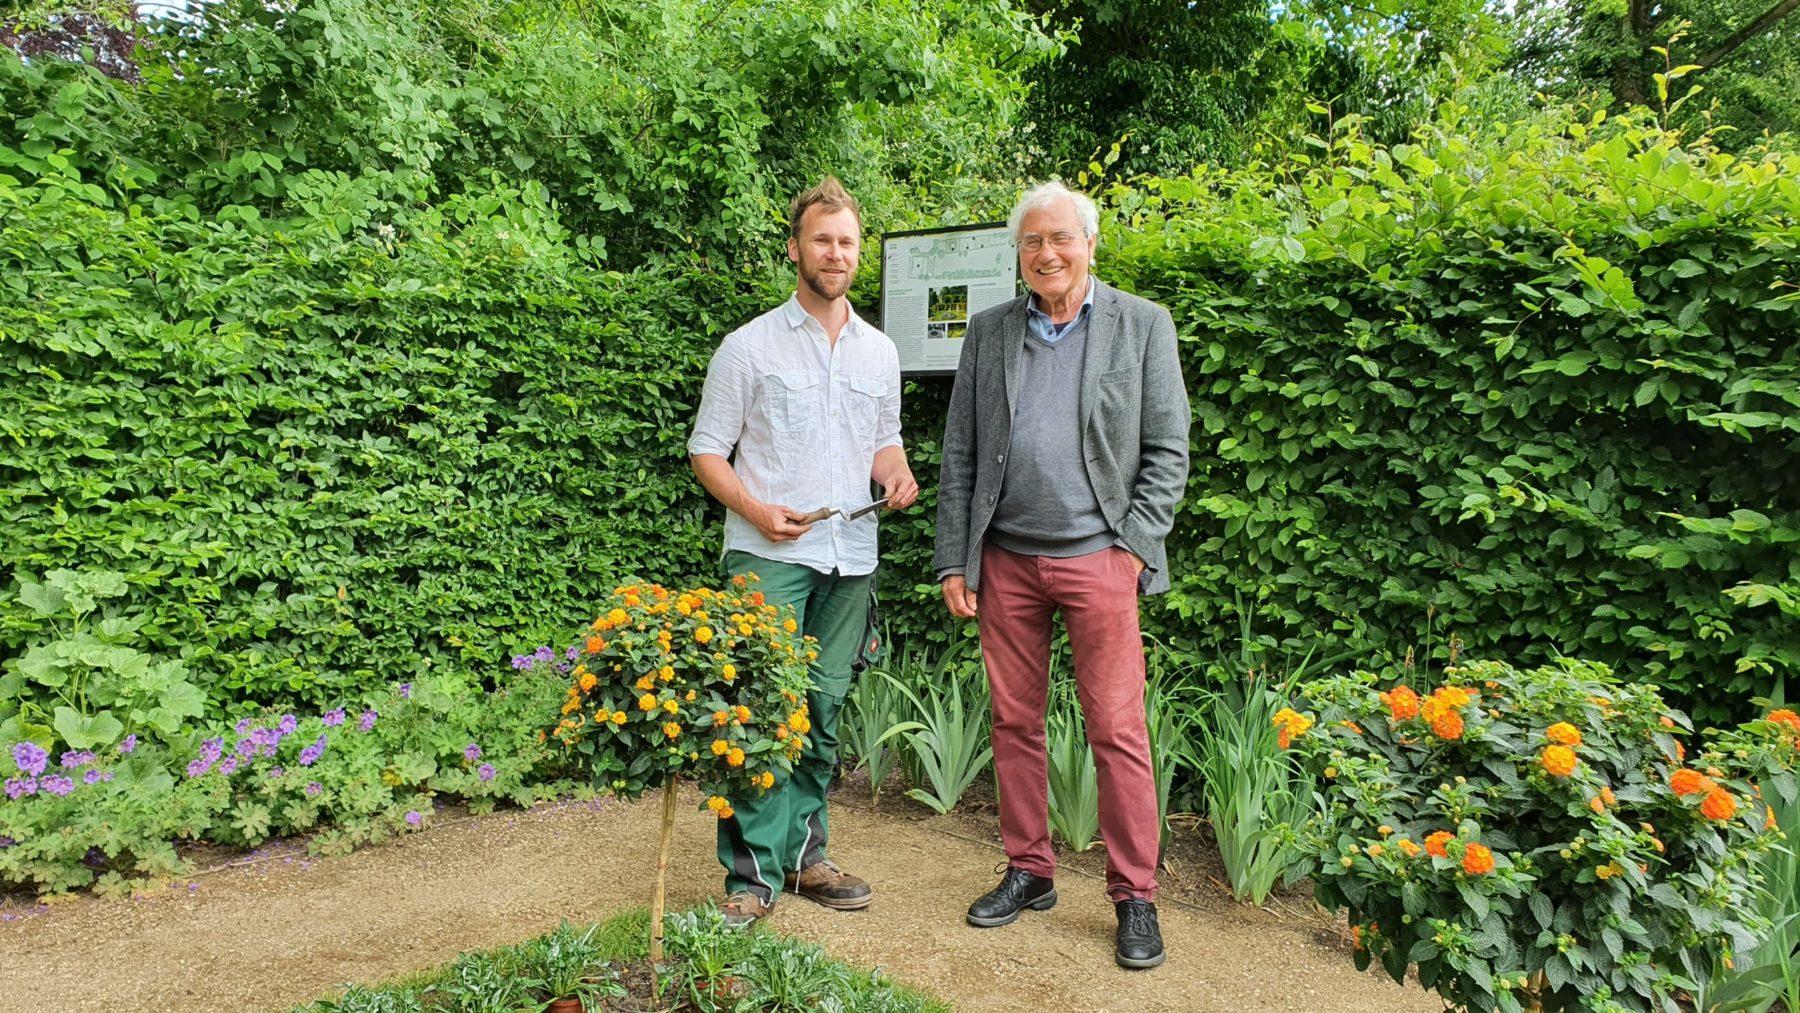 Sven Lieberenz und Wolfgang Immenhausen im Garten der Liebermann-Villa